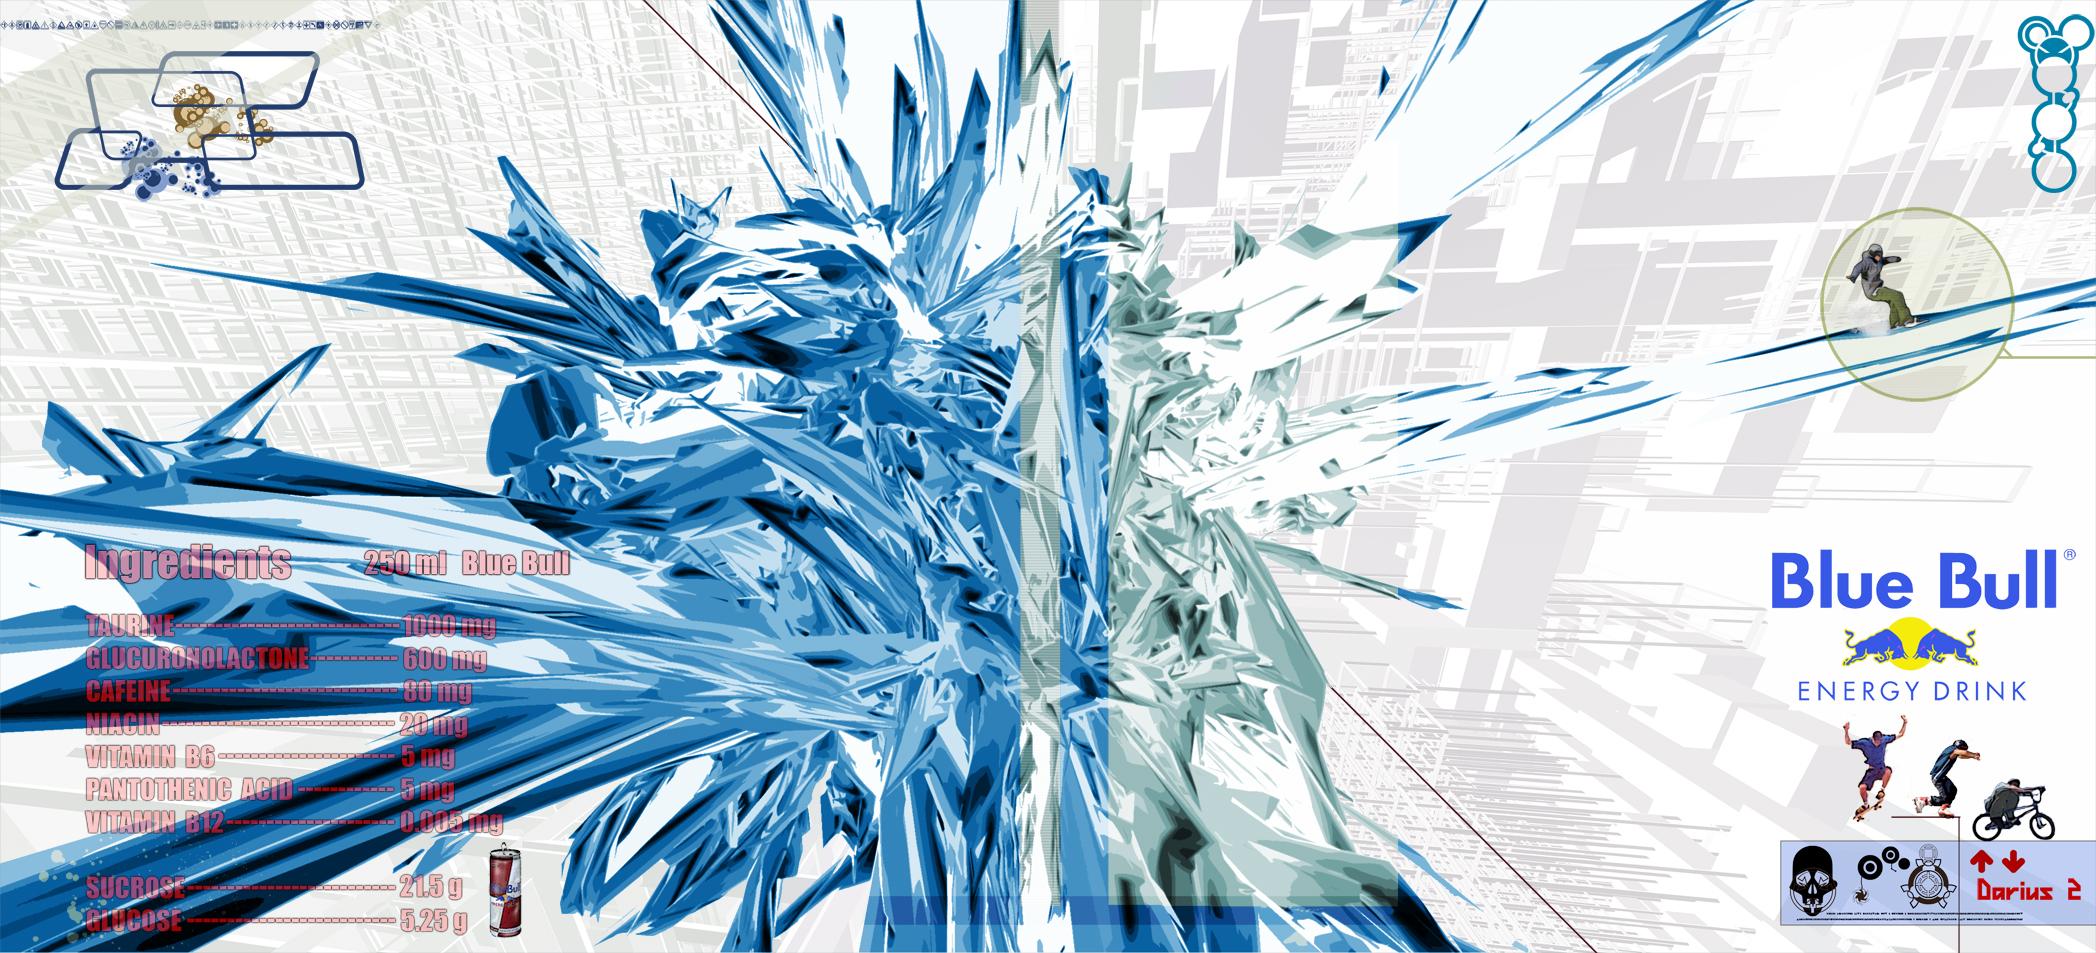 Blue Bull by Darius II 2096x953